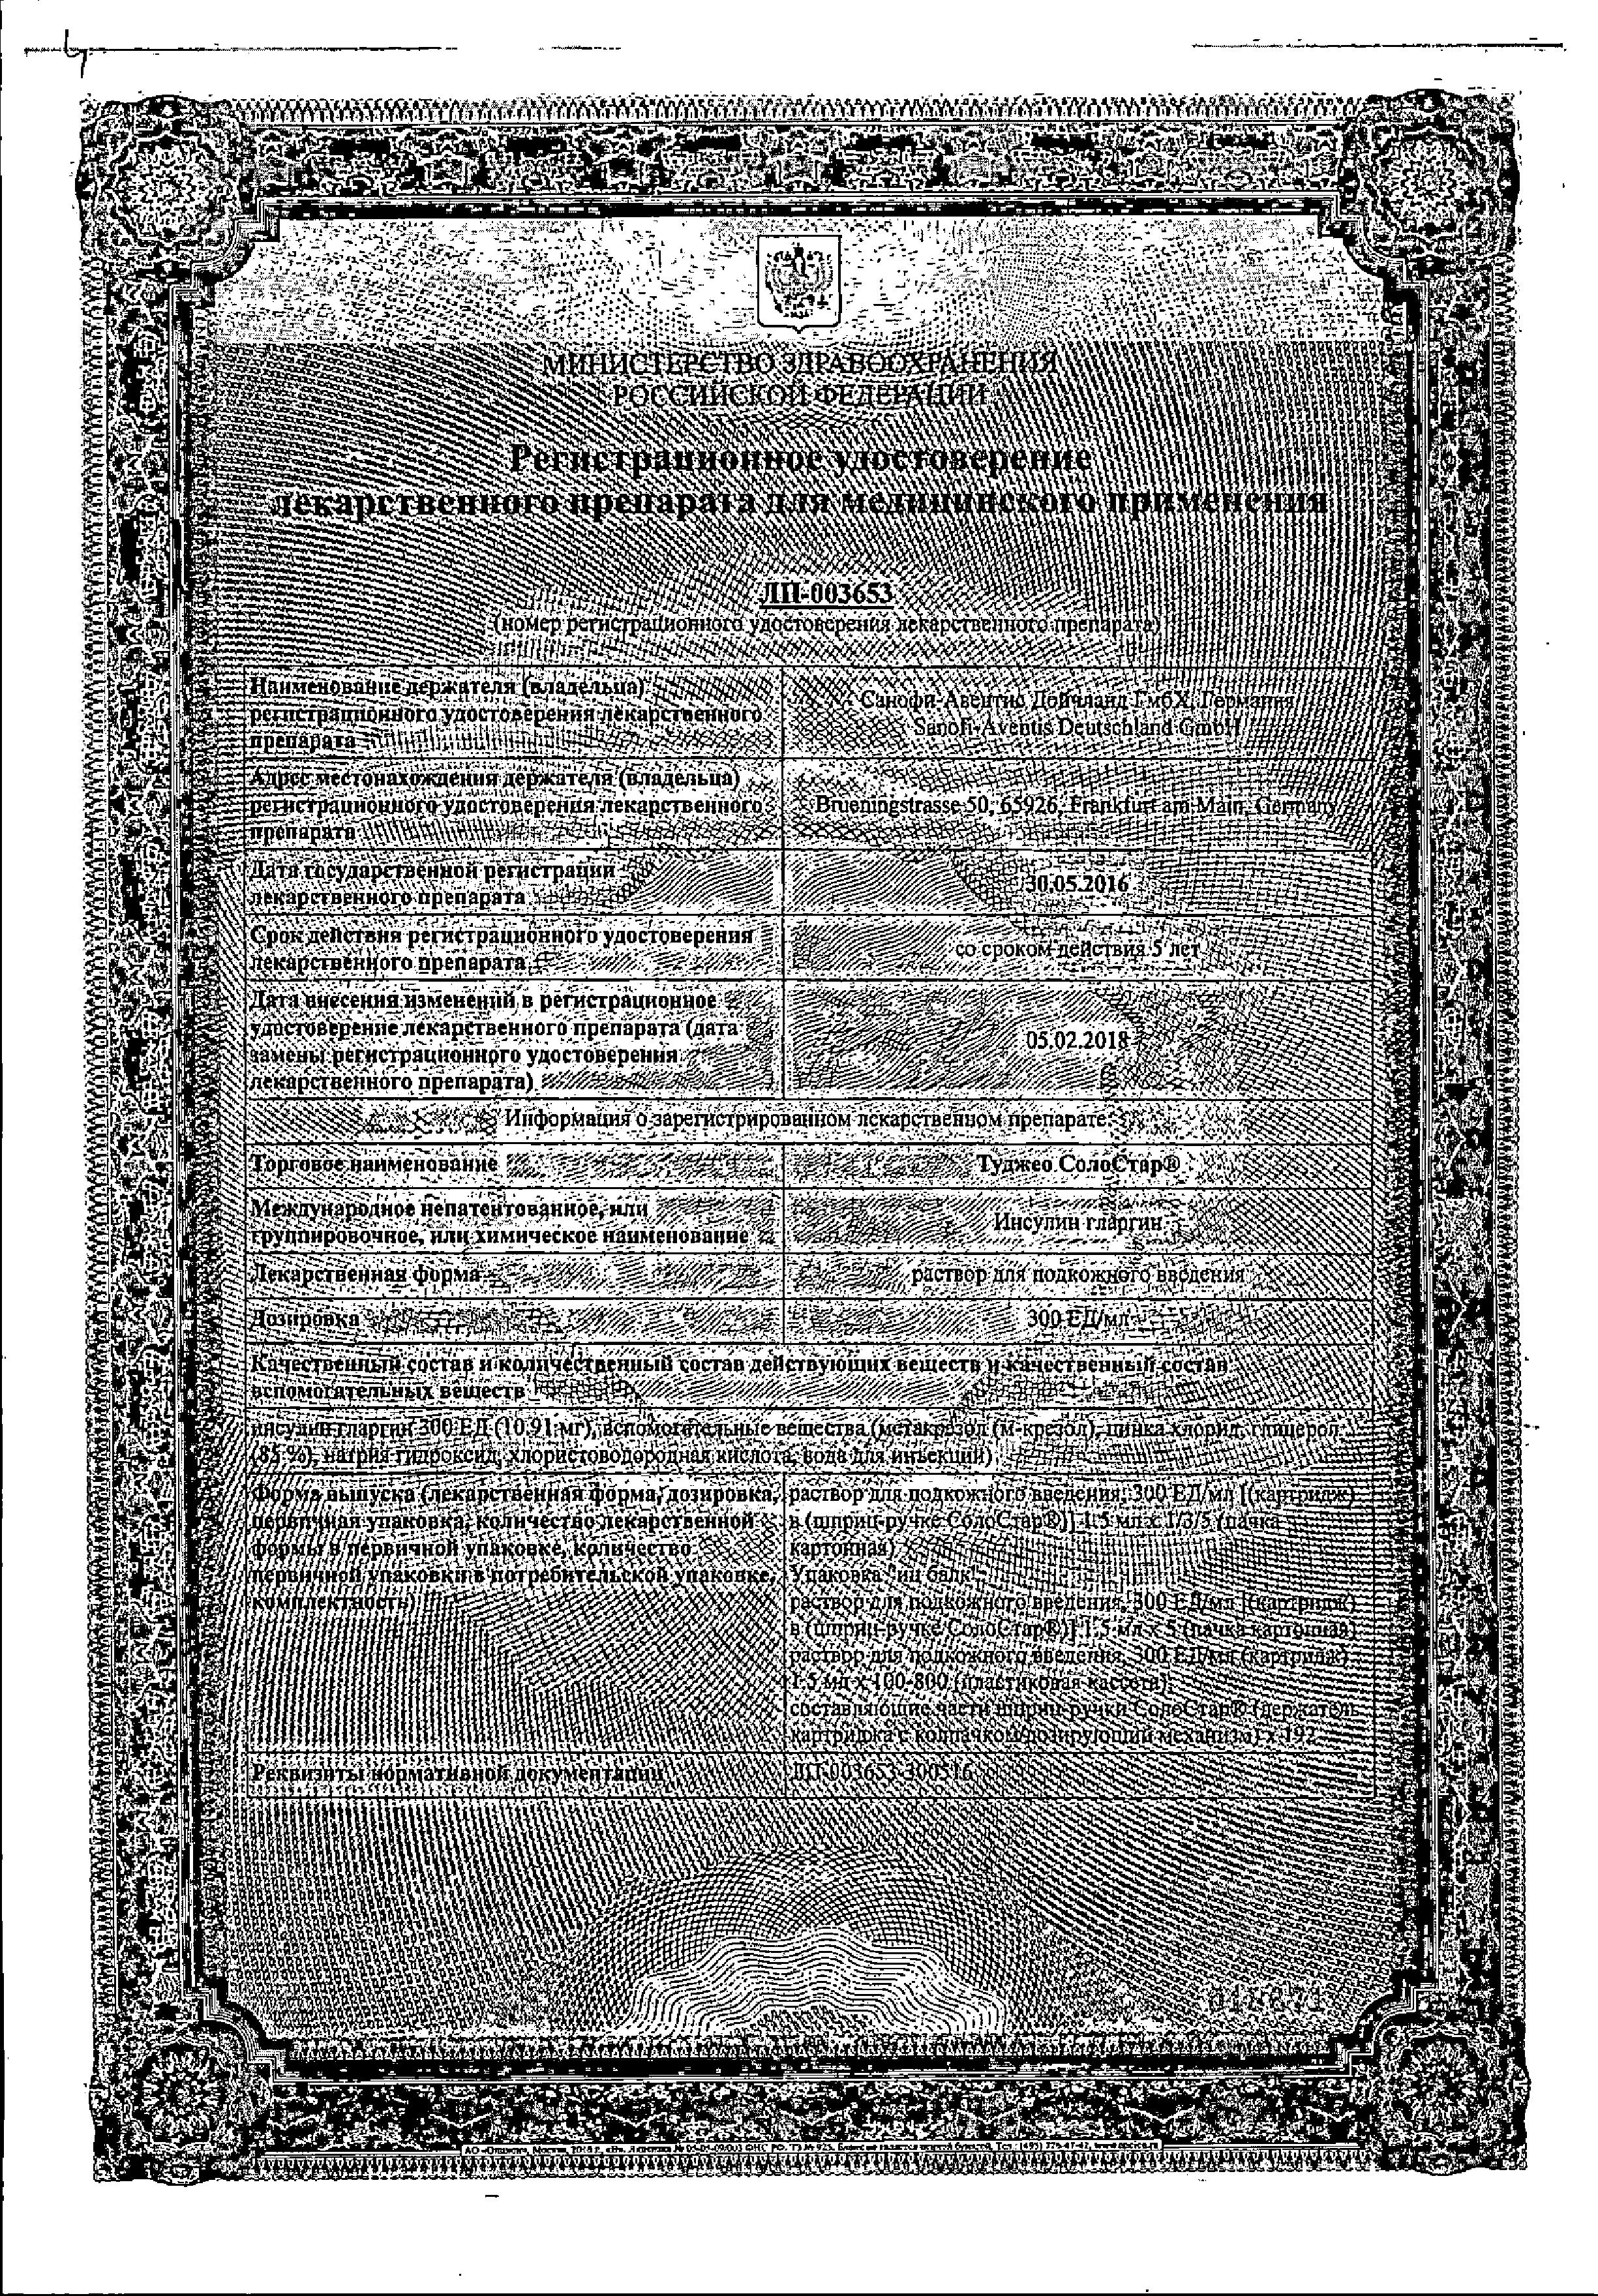 Туджео СолоСтар сертификат